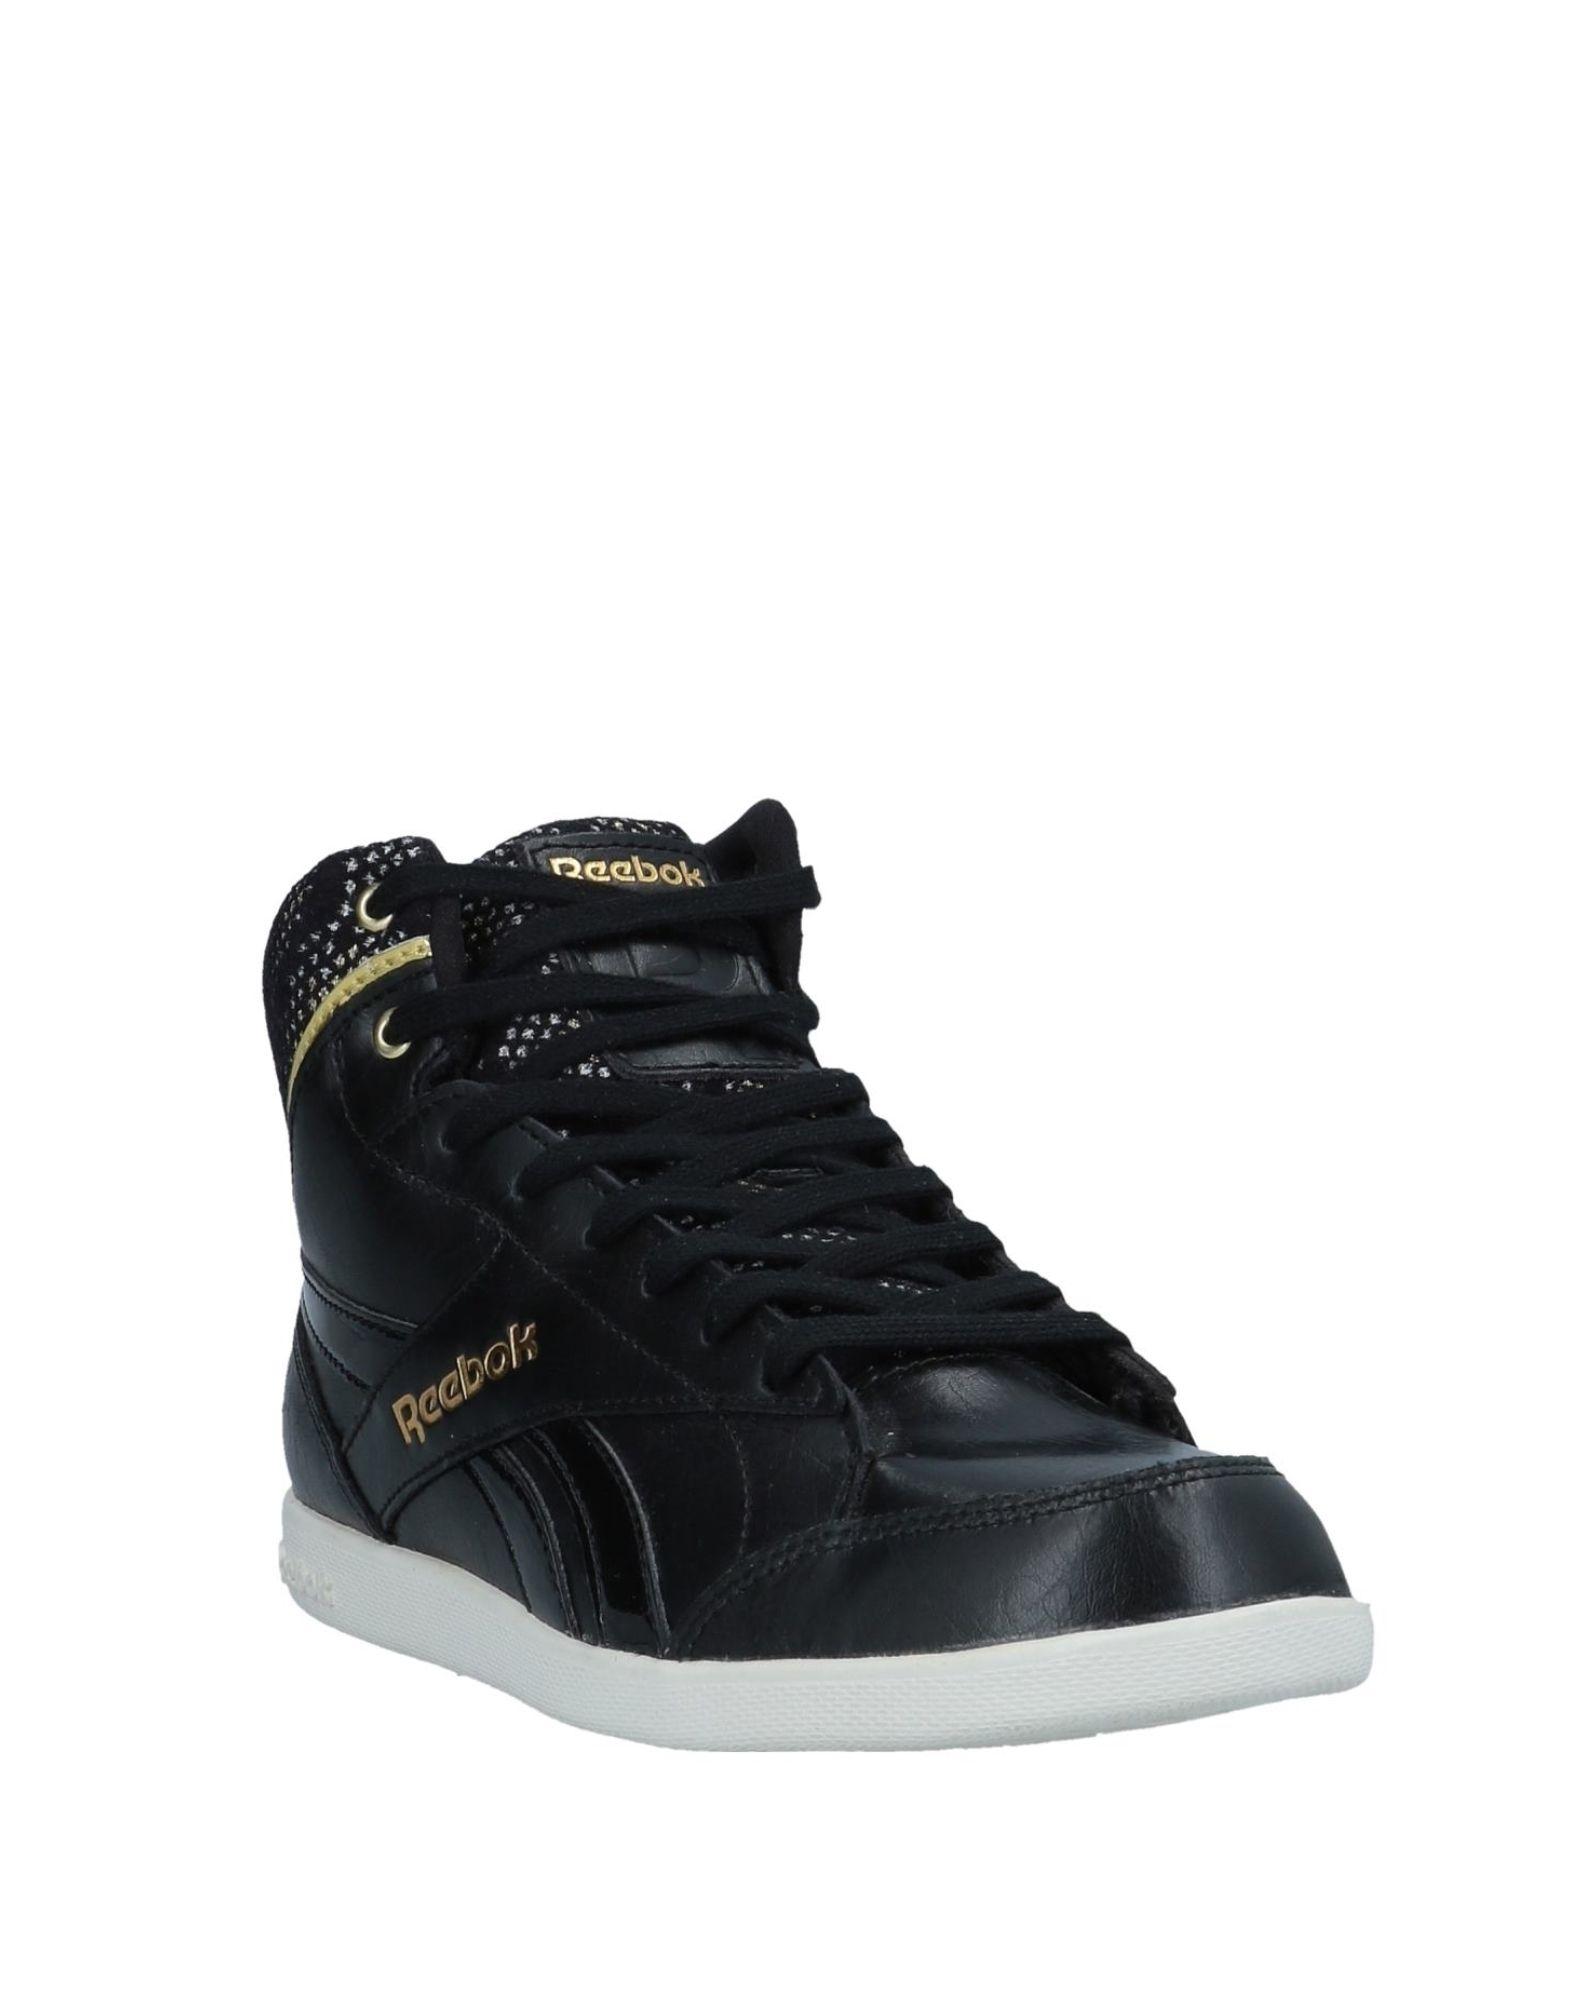 Reebok Sneakers - Women Reebok Sneakers online on    United Kingdom - 11551720BR c66339